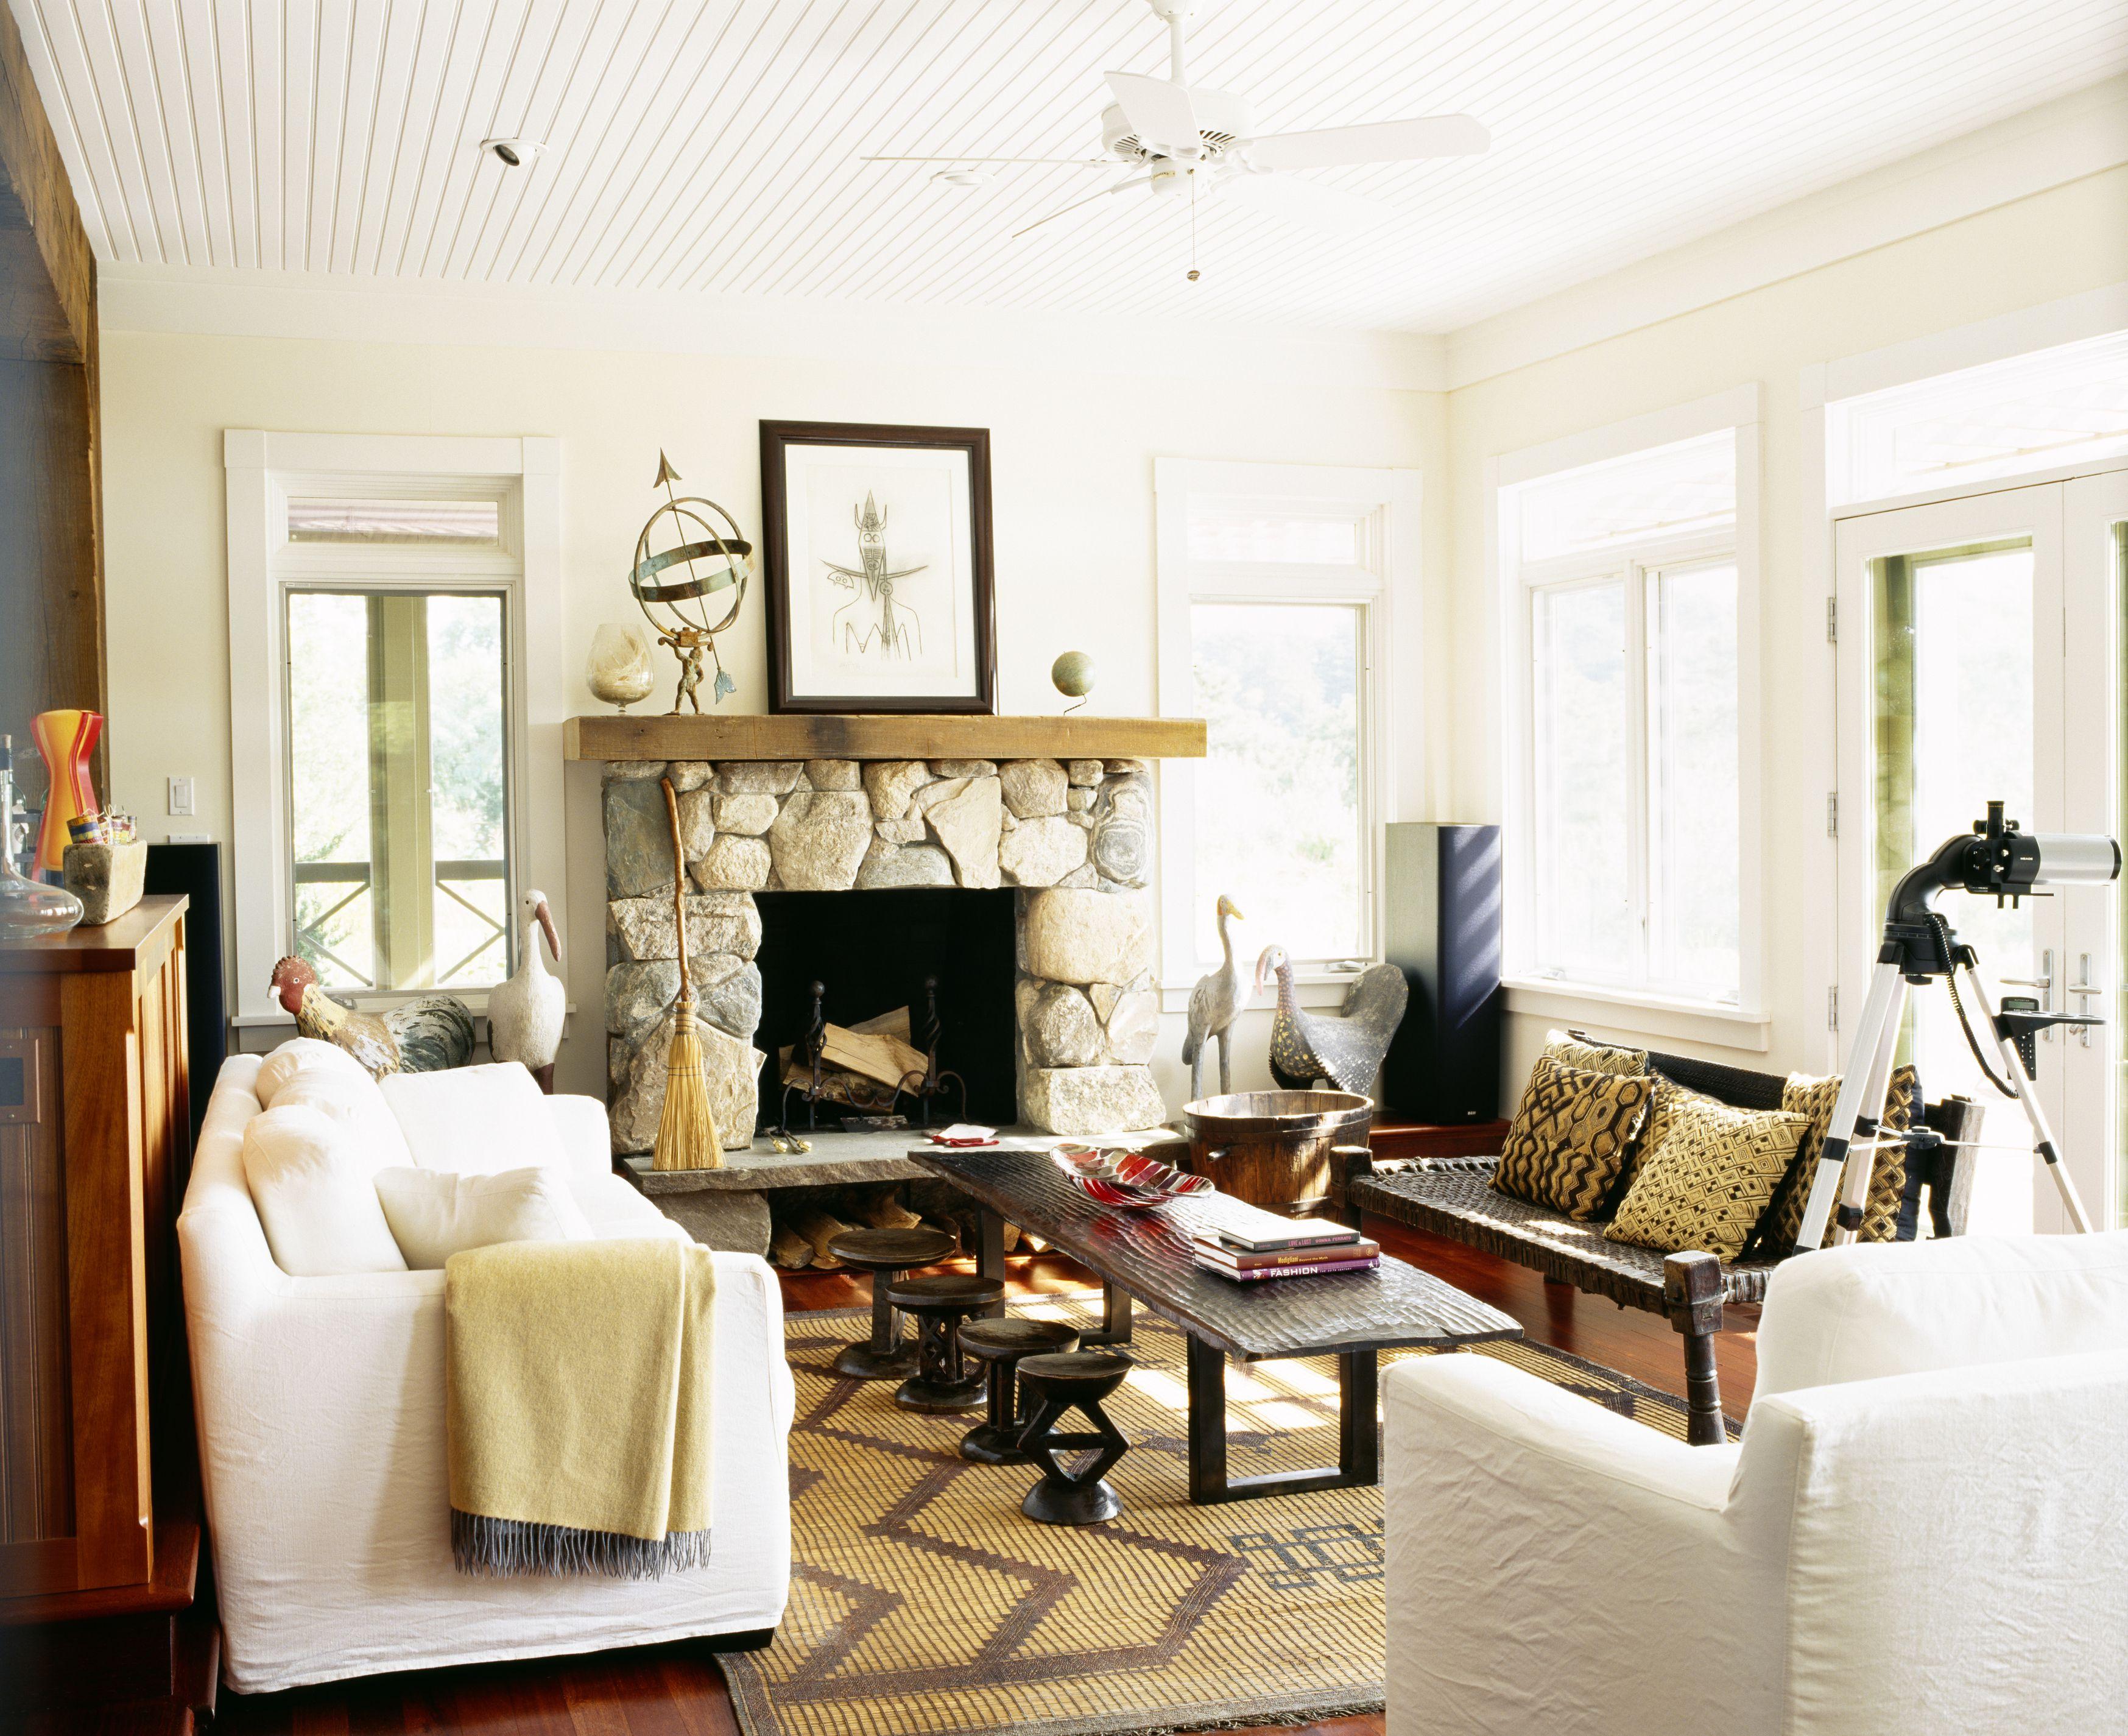 Enchanting Primitive Living Room Ideas Gallery - Living Room Design ...